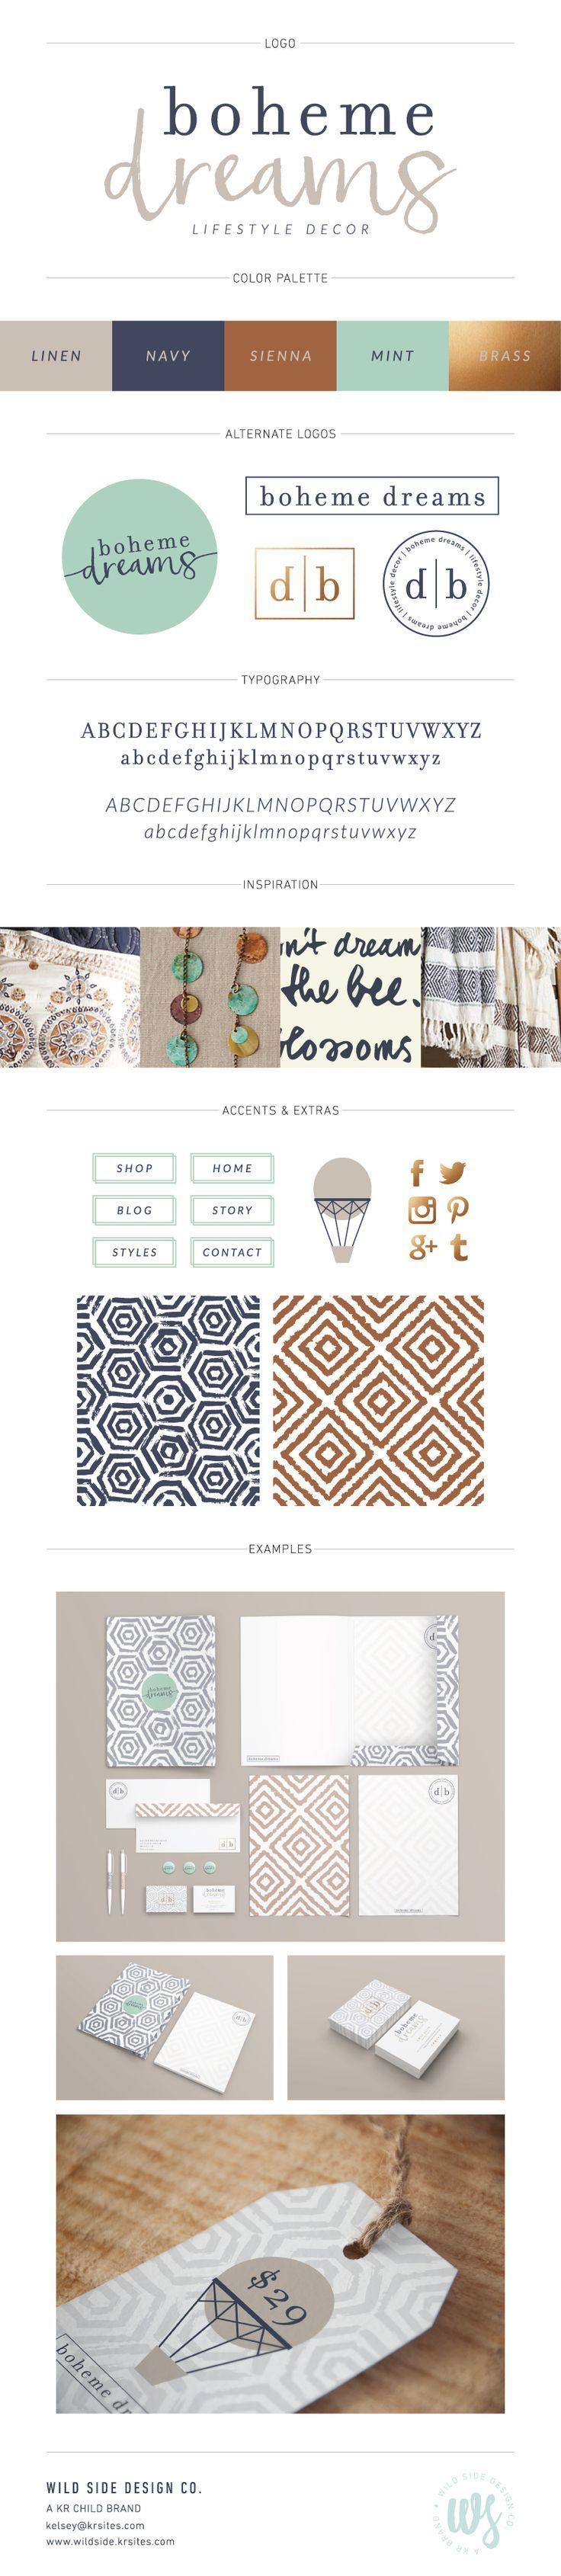 Brand Launch   Brand Style Board   Boho Home Decor Branding   Boheme Dreams Brand Design by Wild Side Design Co.   #brand #print www.wildside.krsites.com